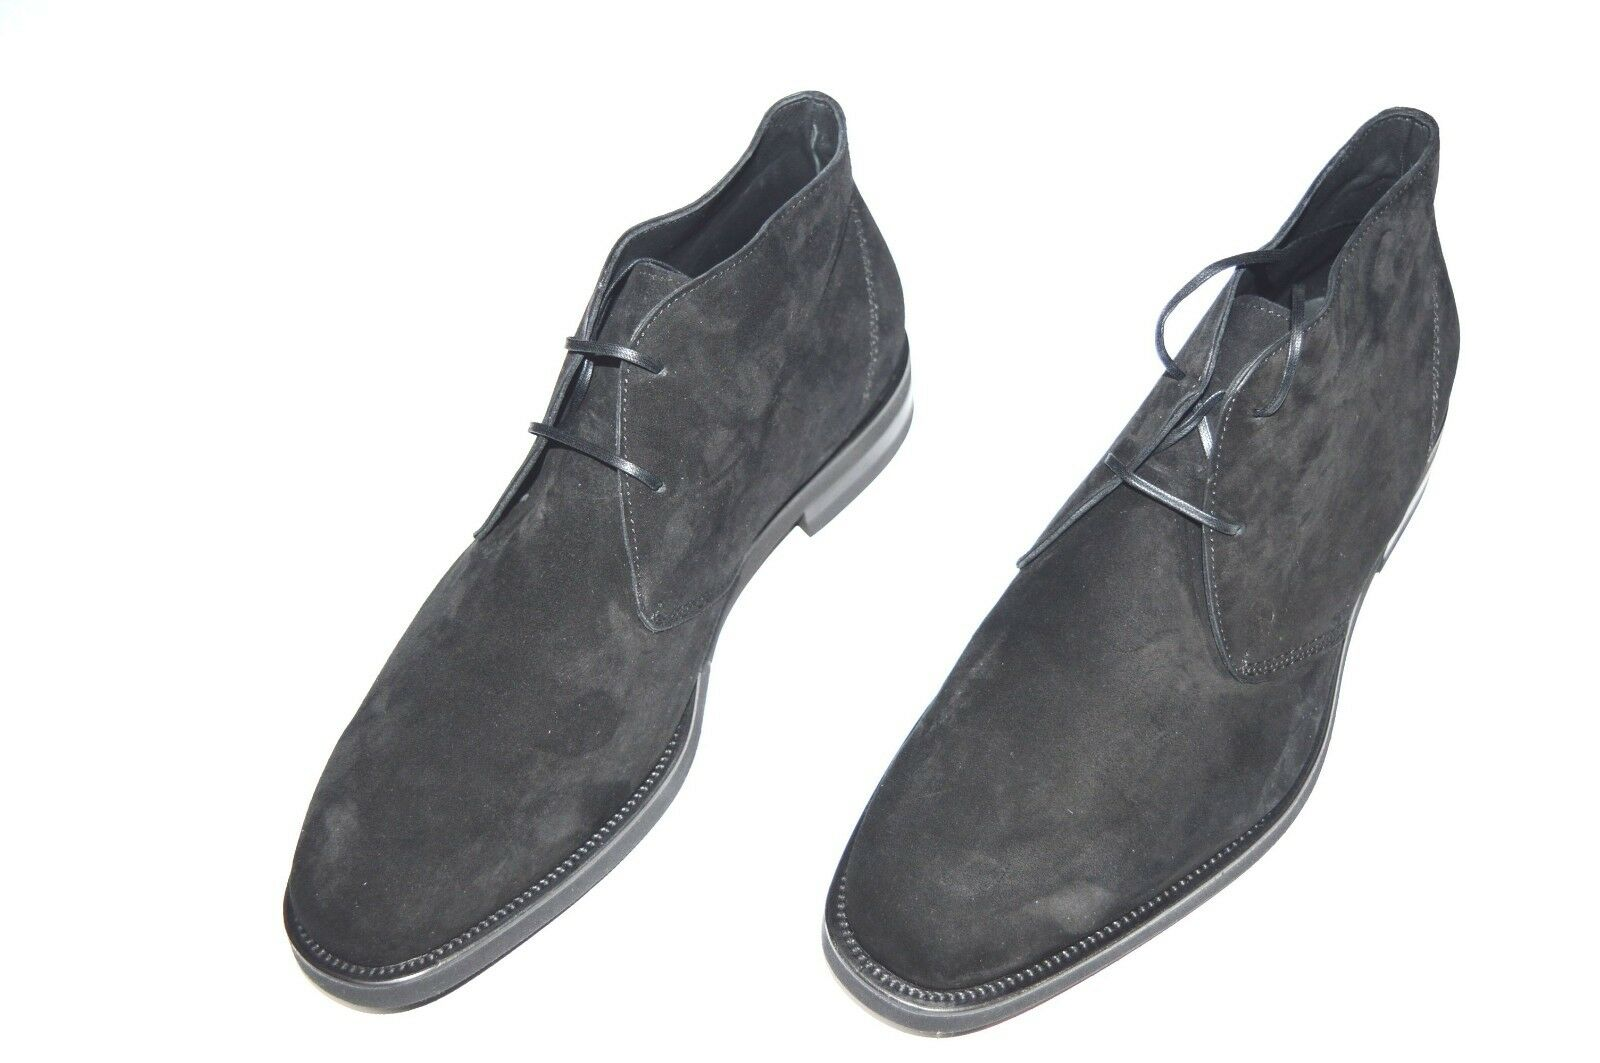 Nuevo STEFANO RICCI Zapatos Talla nos 10.5 (COD A60)